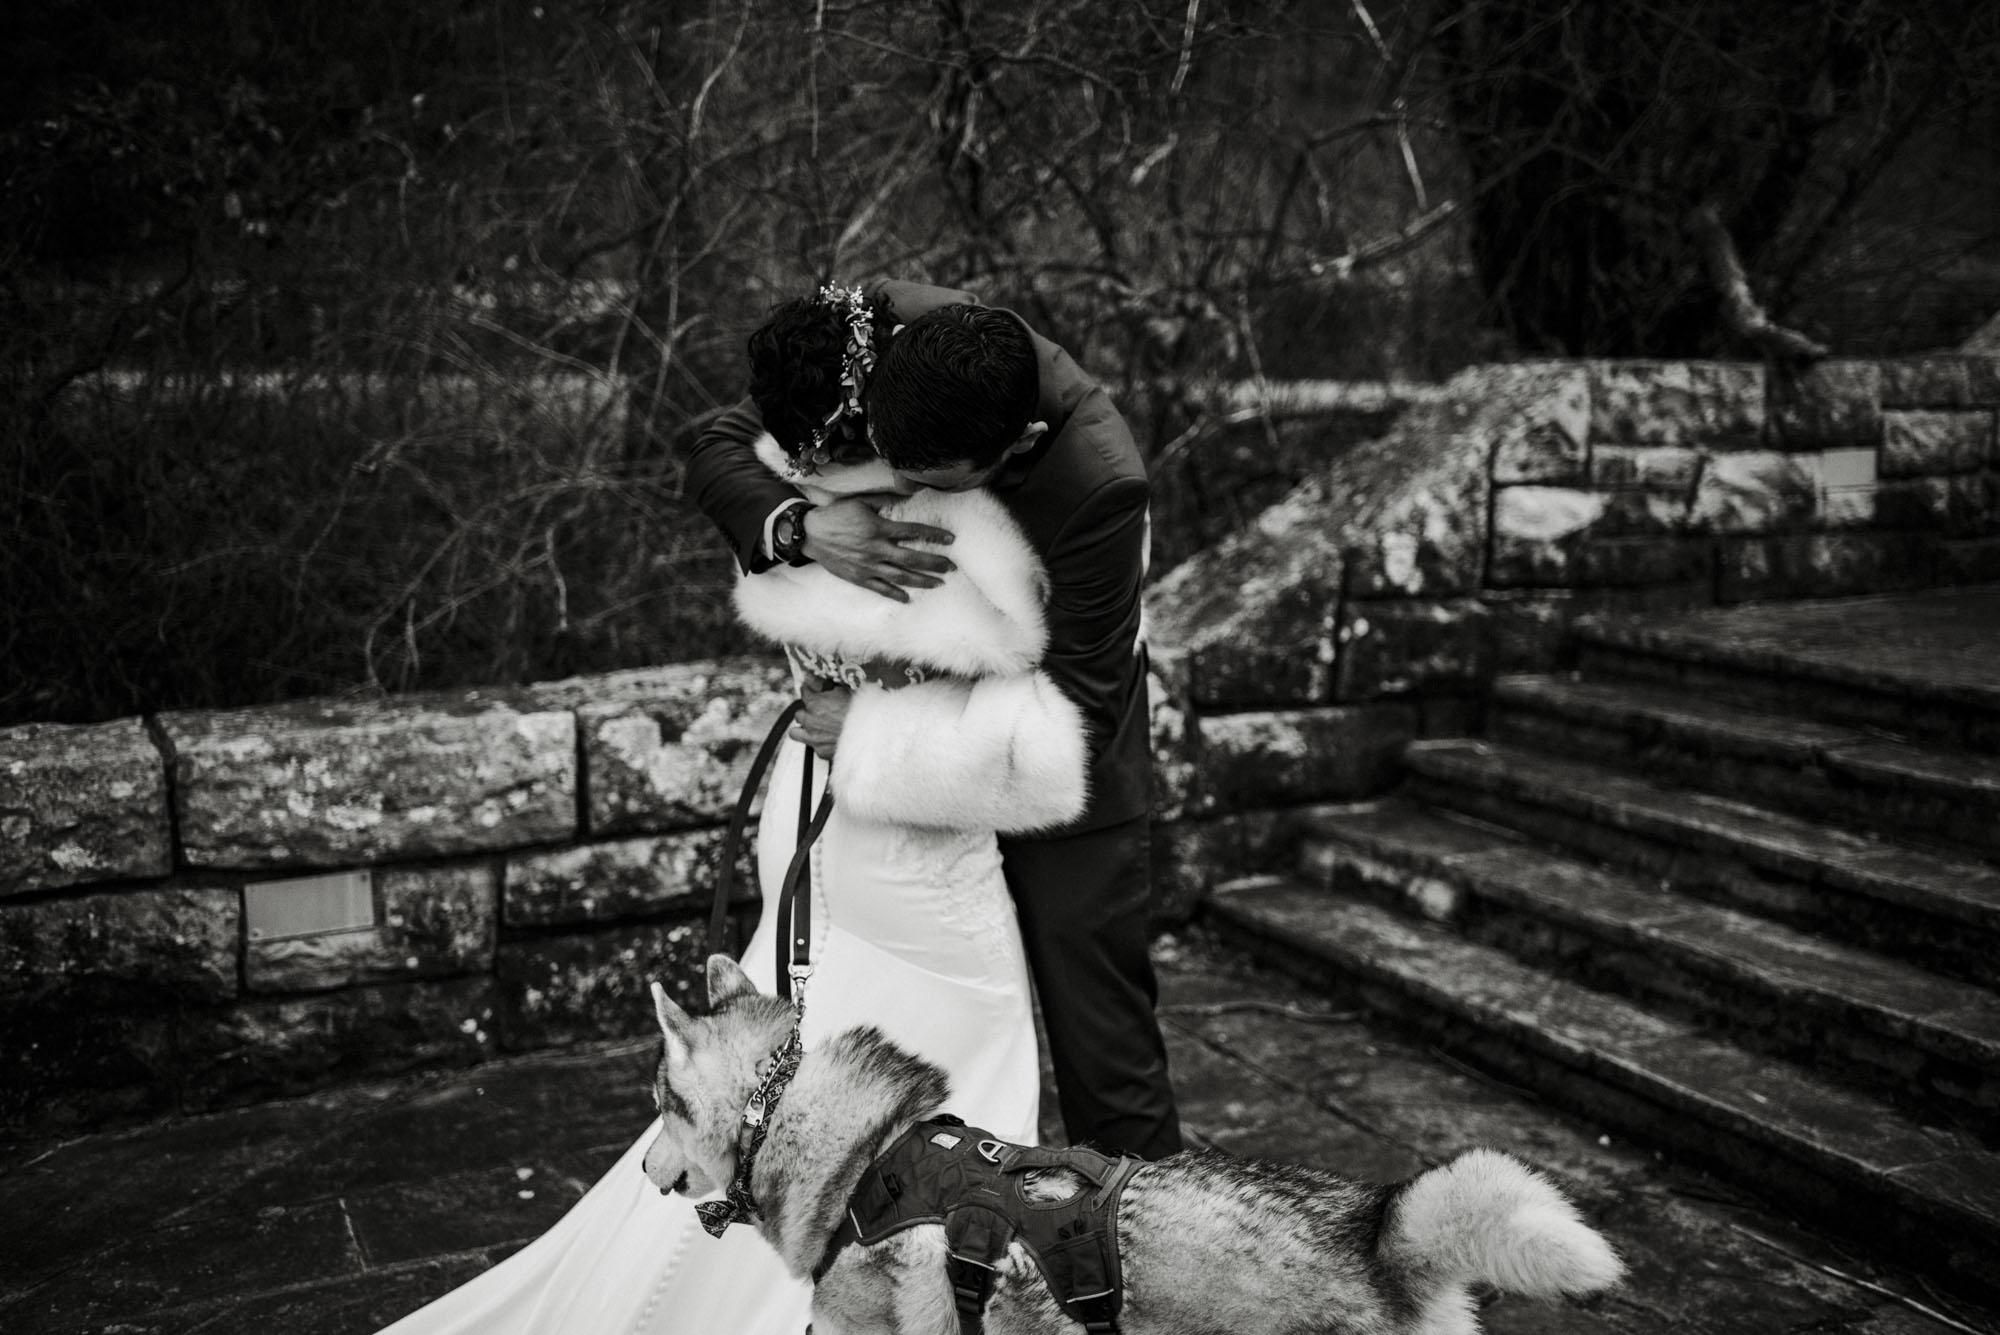 Game of Thrones Elopement - Winter Elopement - Shenandoah National Park Elopement Photographer - Virginia Adventure Photographer - Blue Ridge Parkway Elopement Photographer_8.jpg